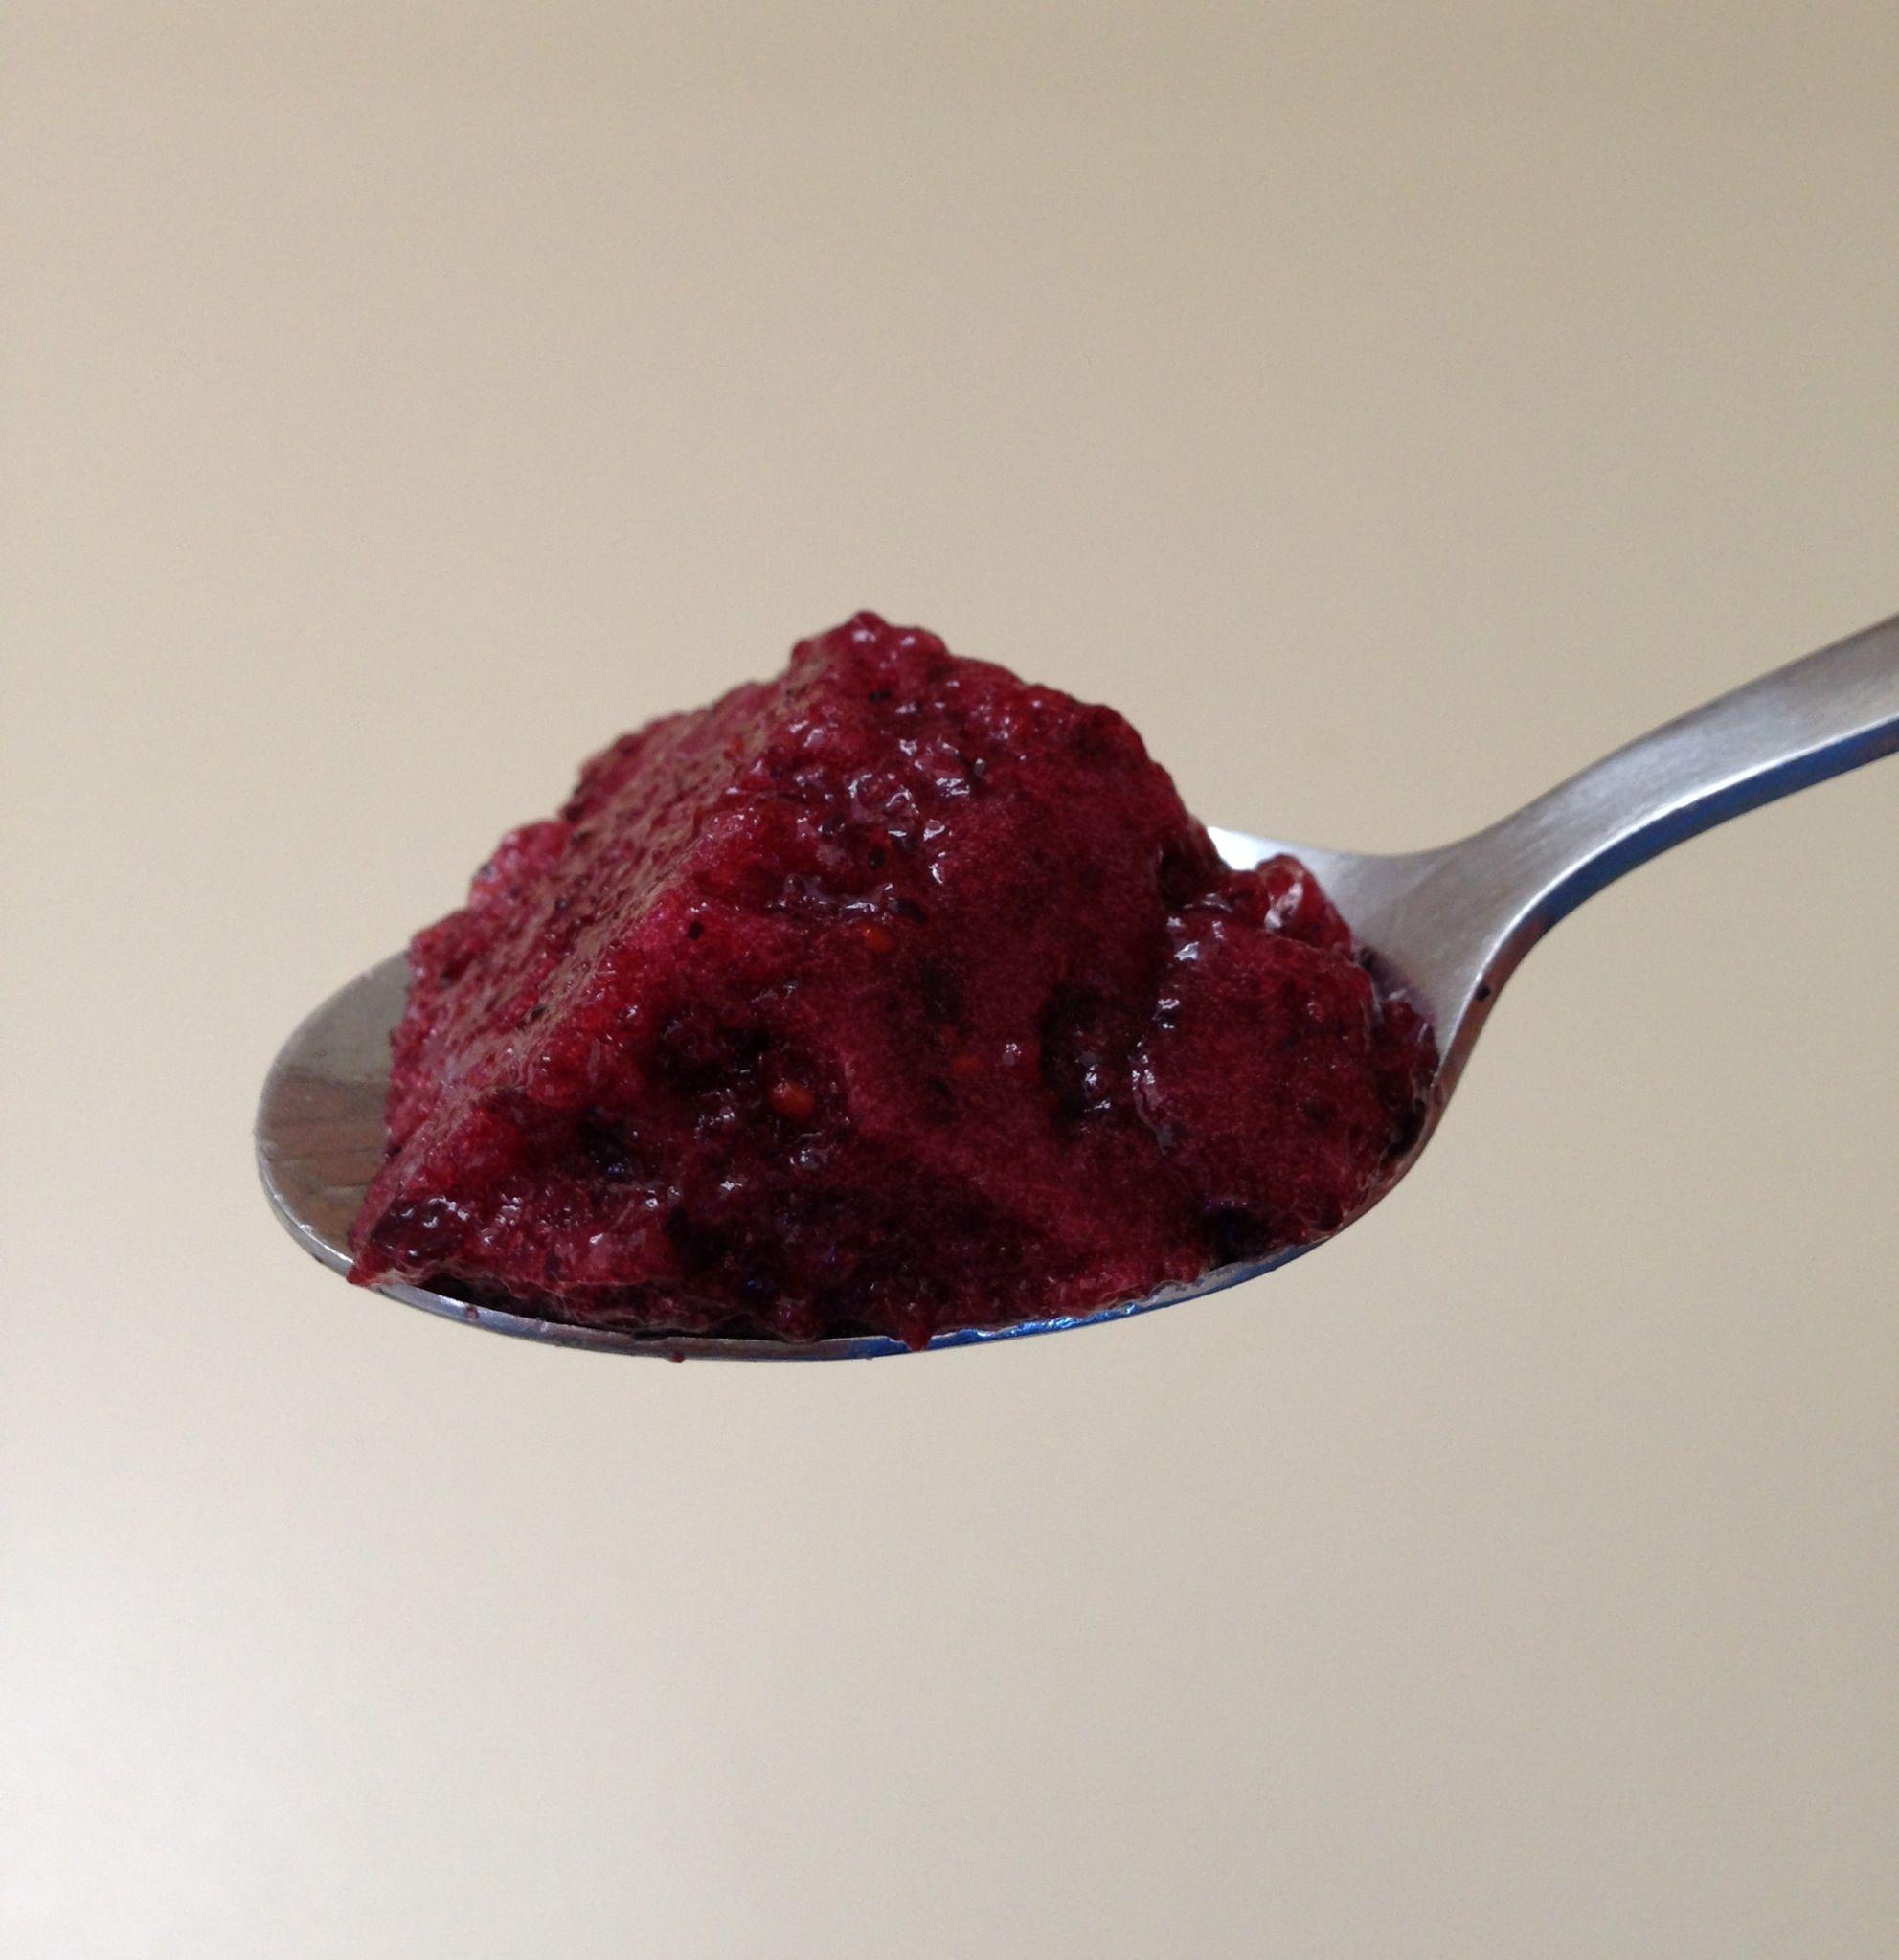 Aerated Blueberry Gelatin Gelatin, Blueberry, Real food